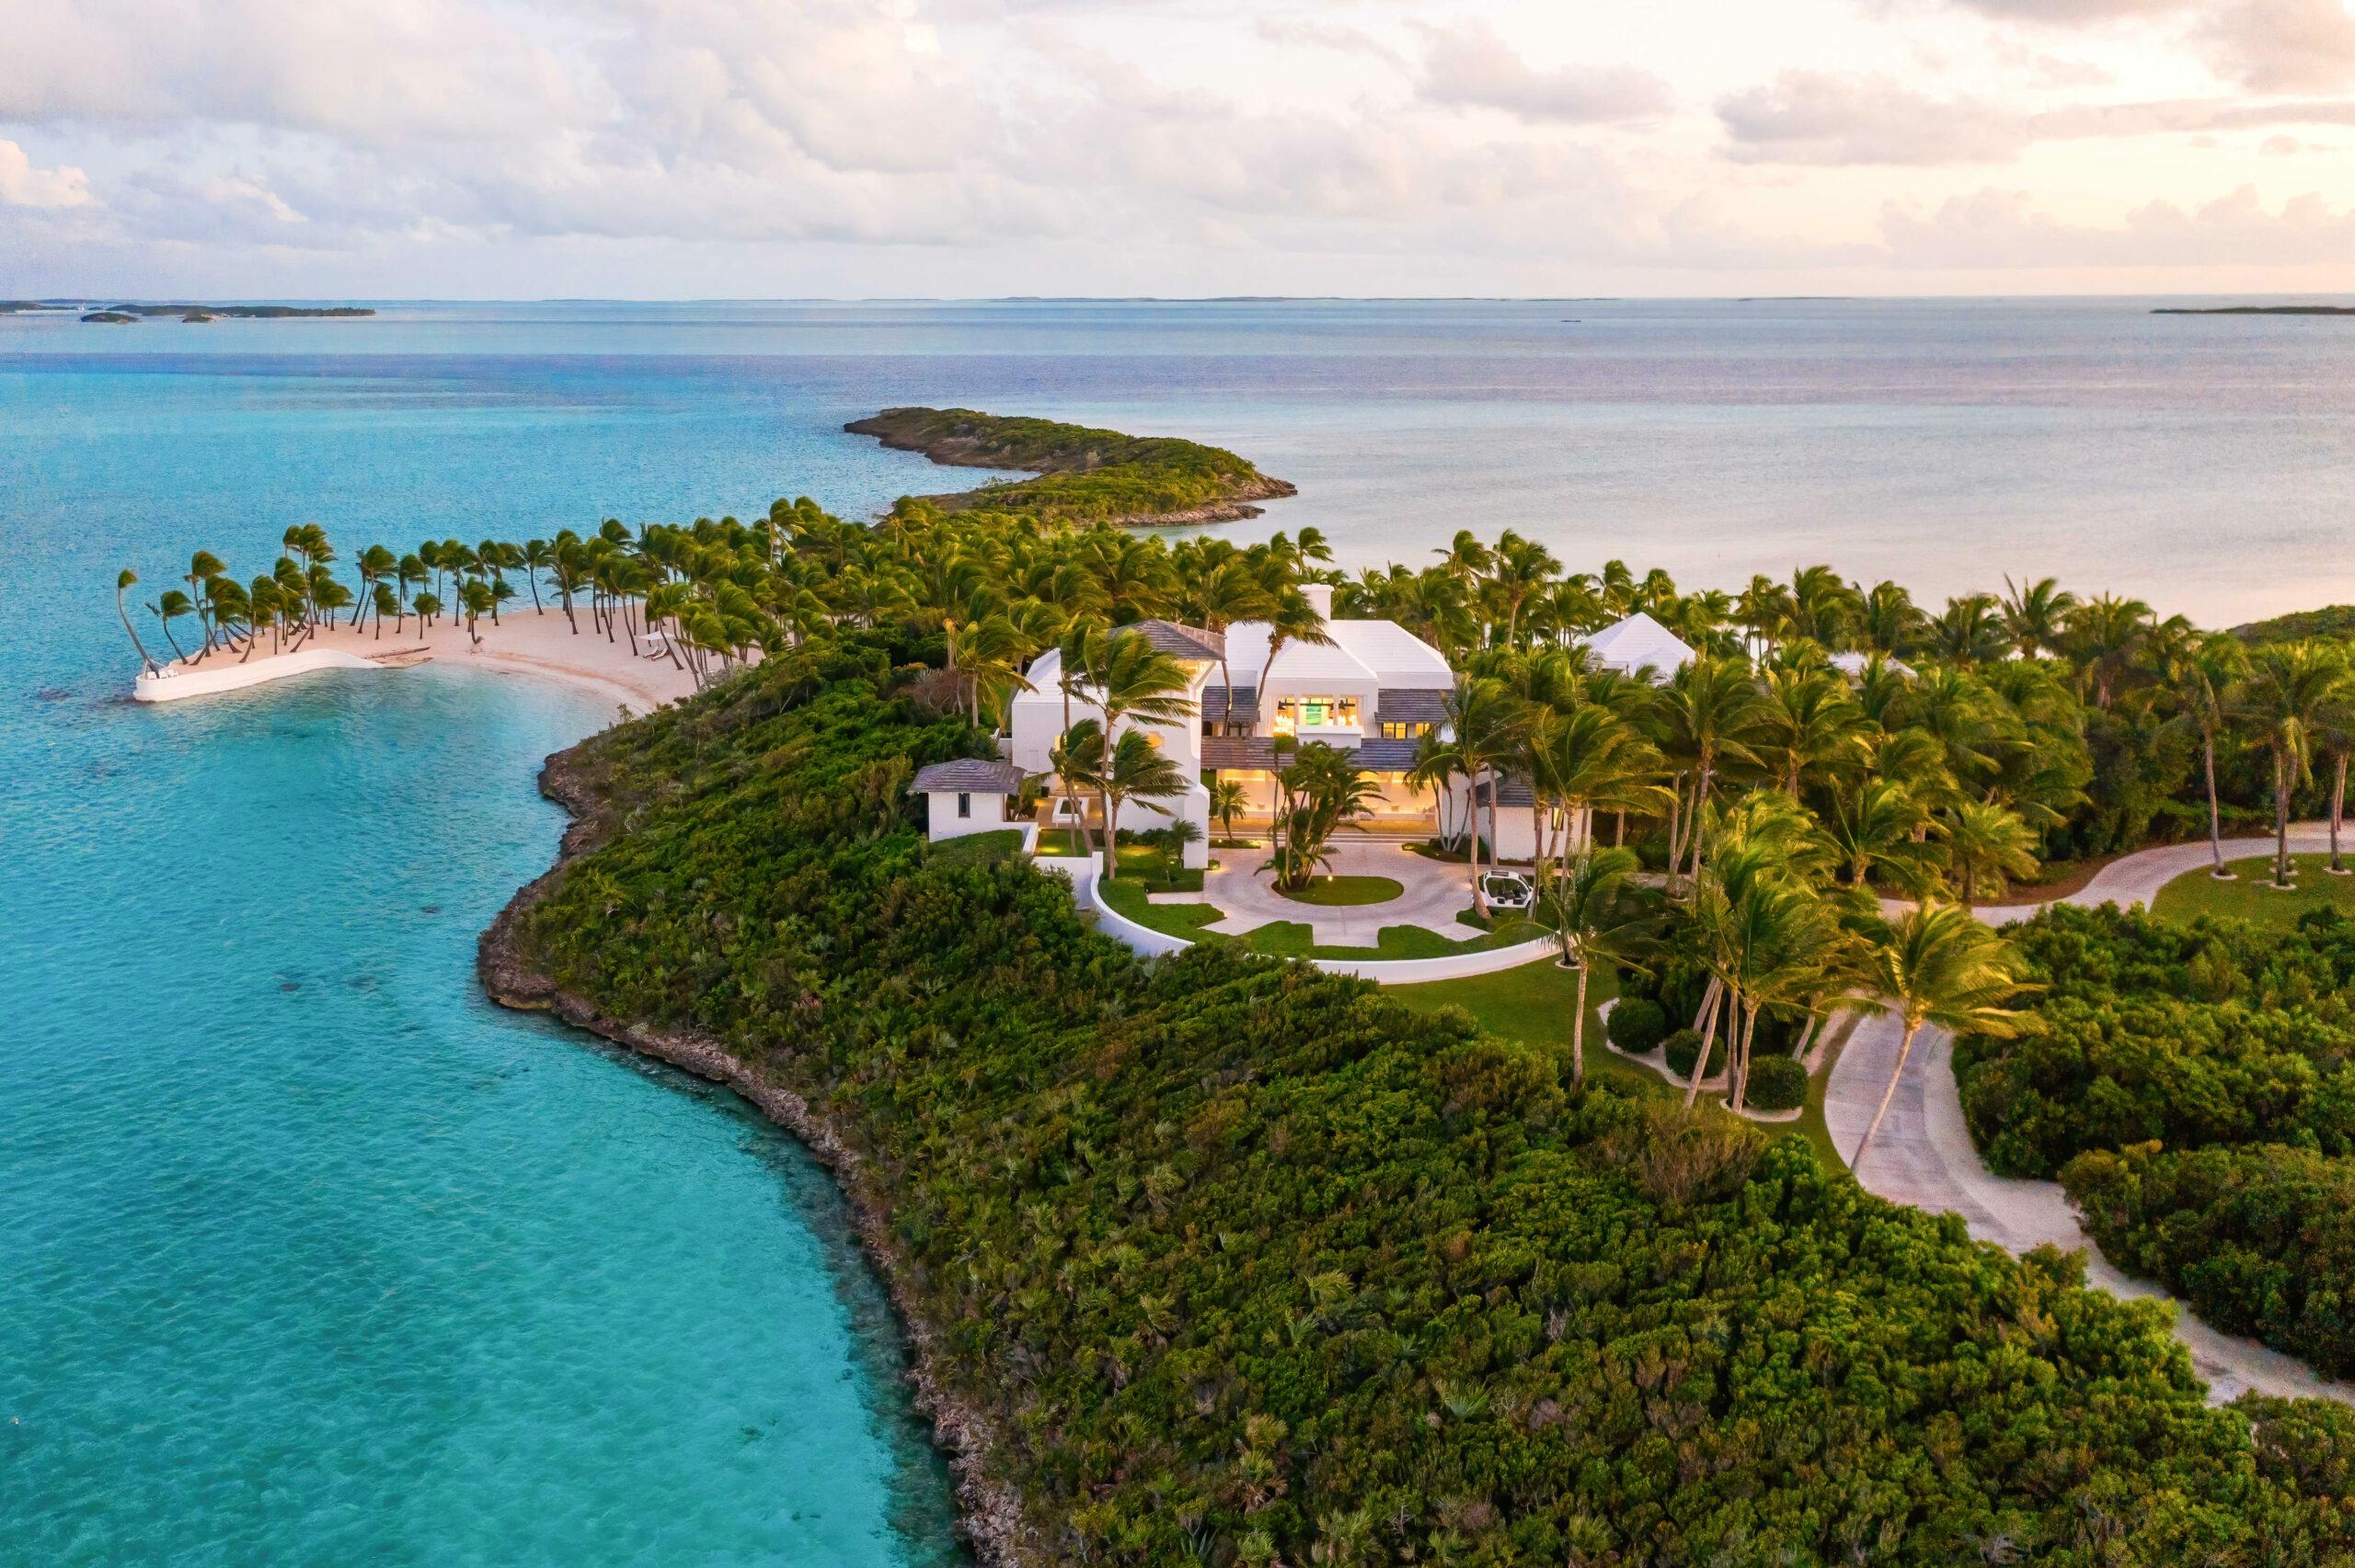 Tour Religion Hill and Tim McGraw's $35 million non-public island